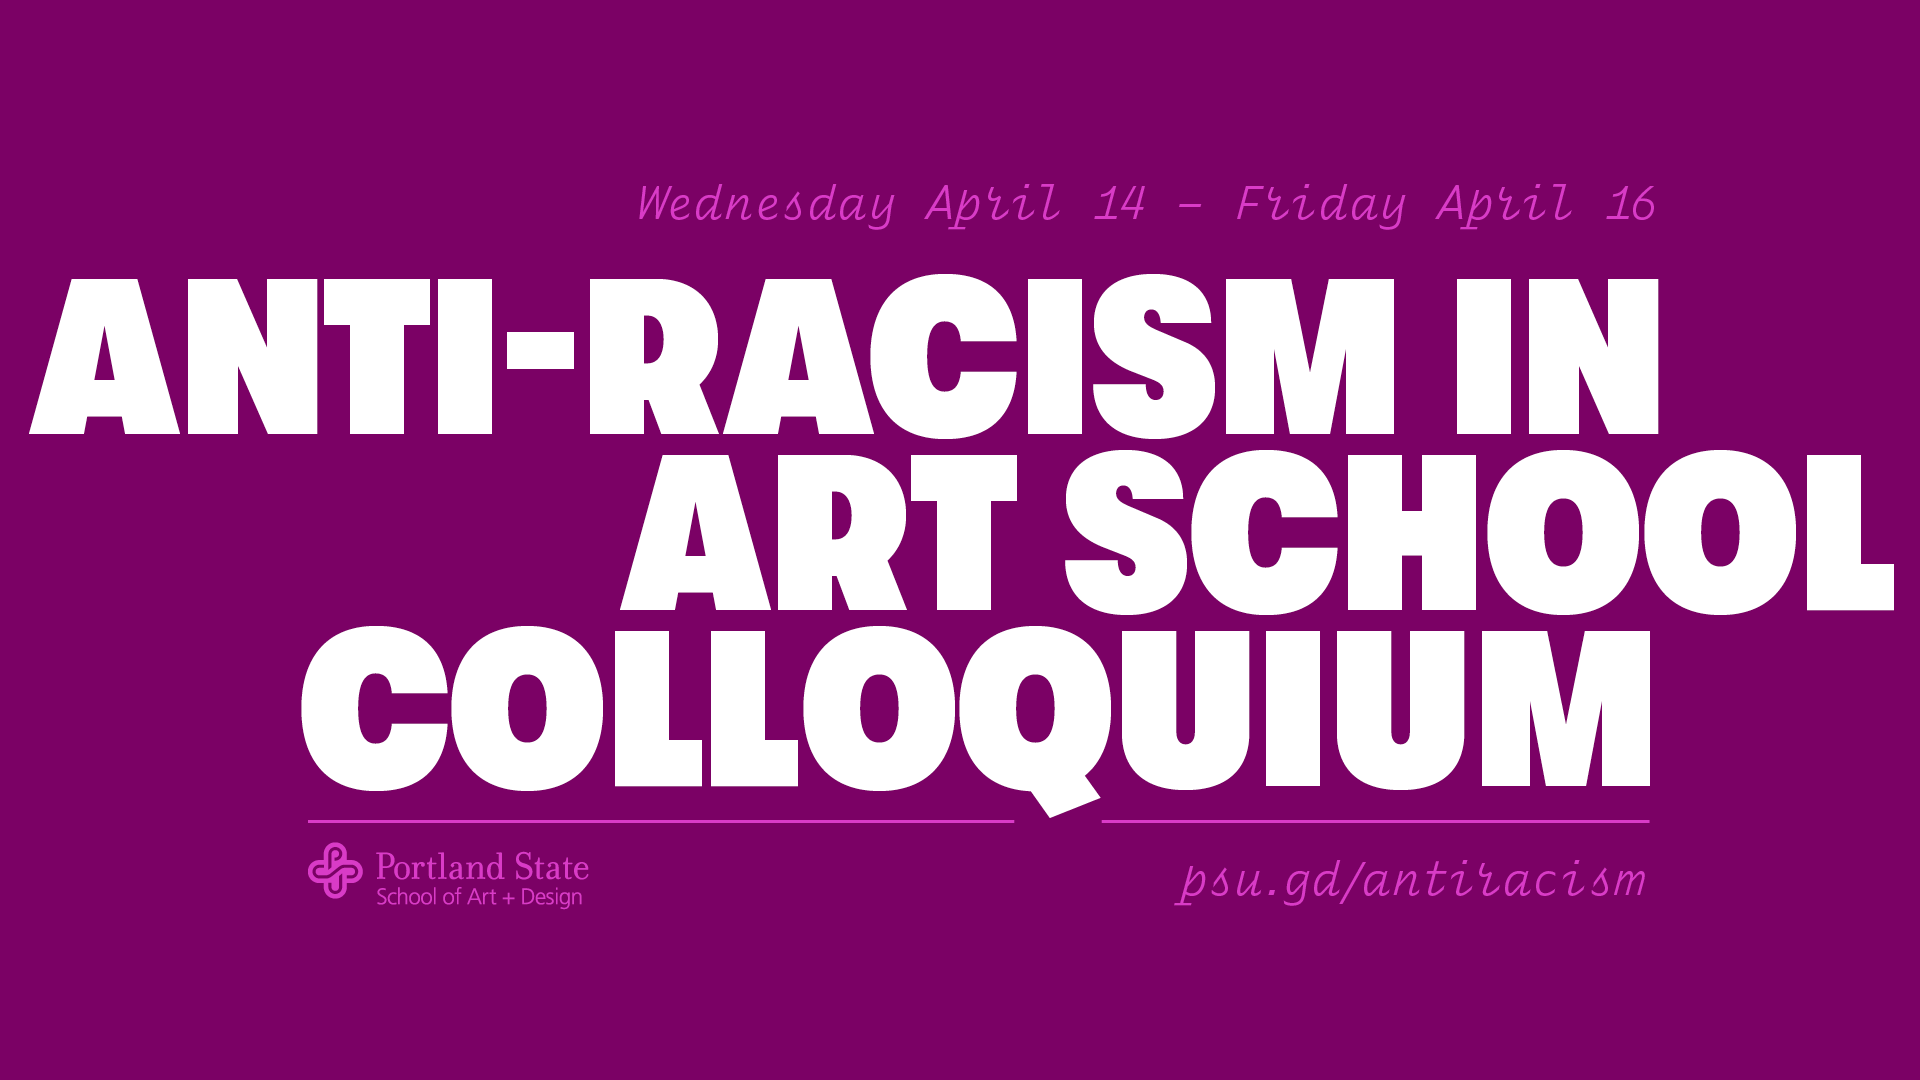 Anti-Racism in Art School Colloquium: Wednesday, April 14 –Friday, April 16. psu.gd/antiracism. Portland State University School of Art + Design